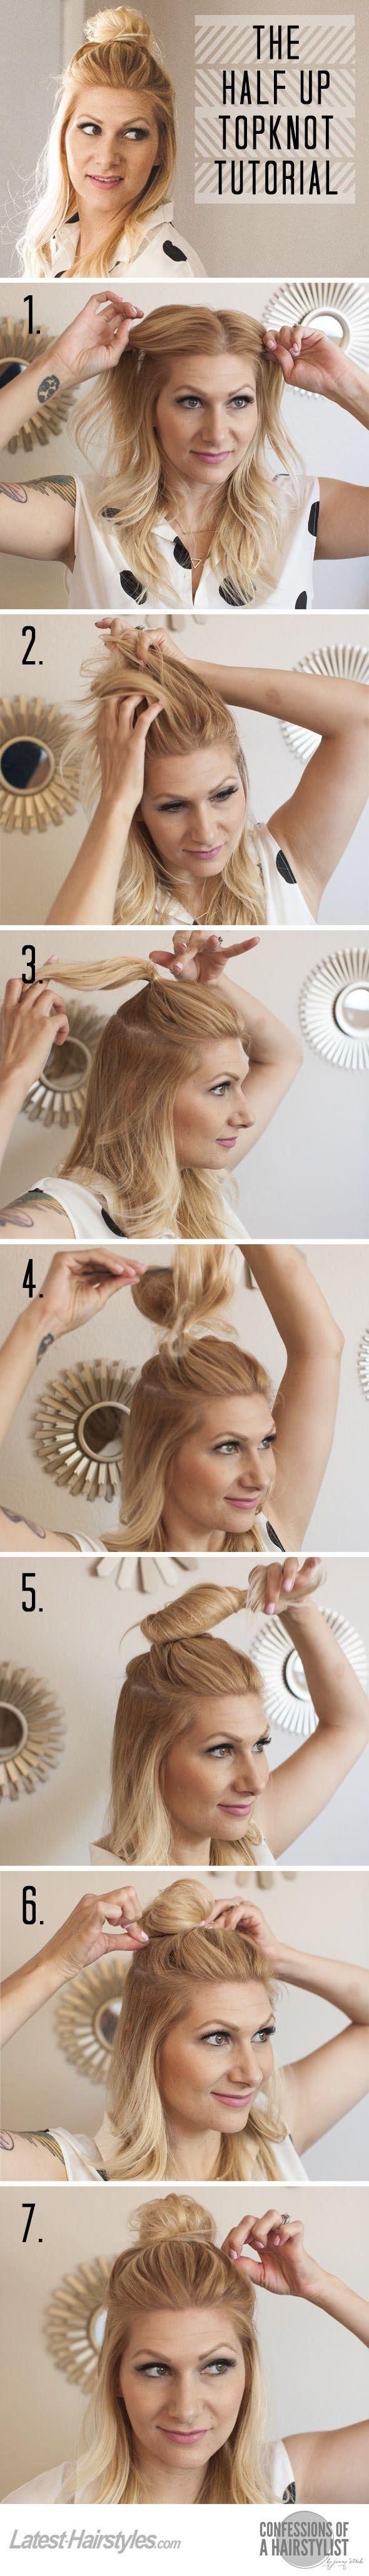 best cool hair images on pinterest cute hairstyles hair ideas